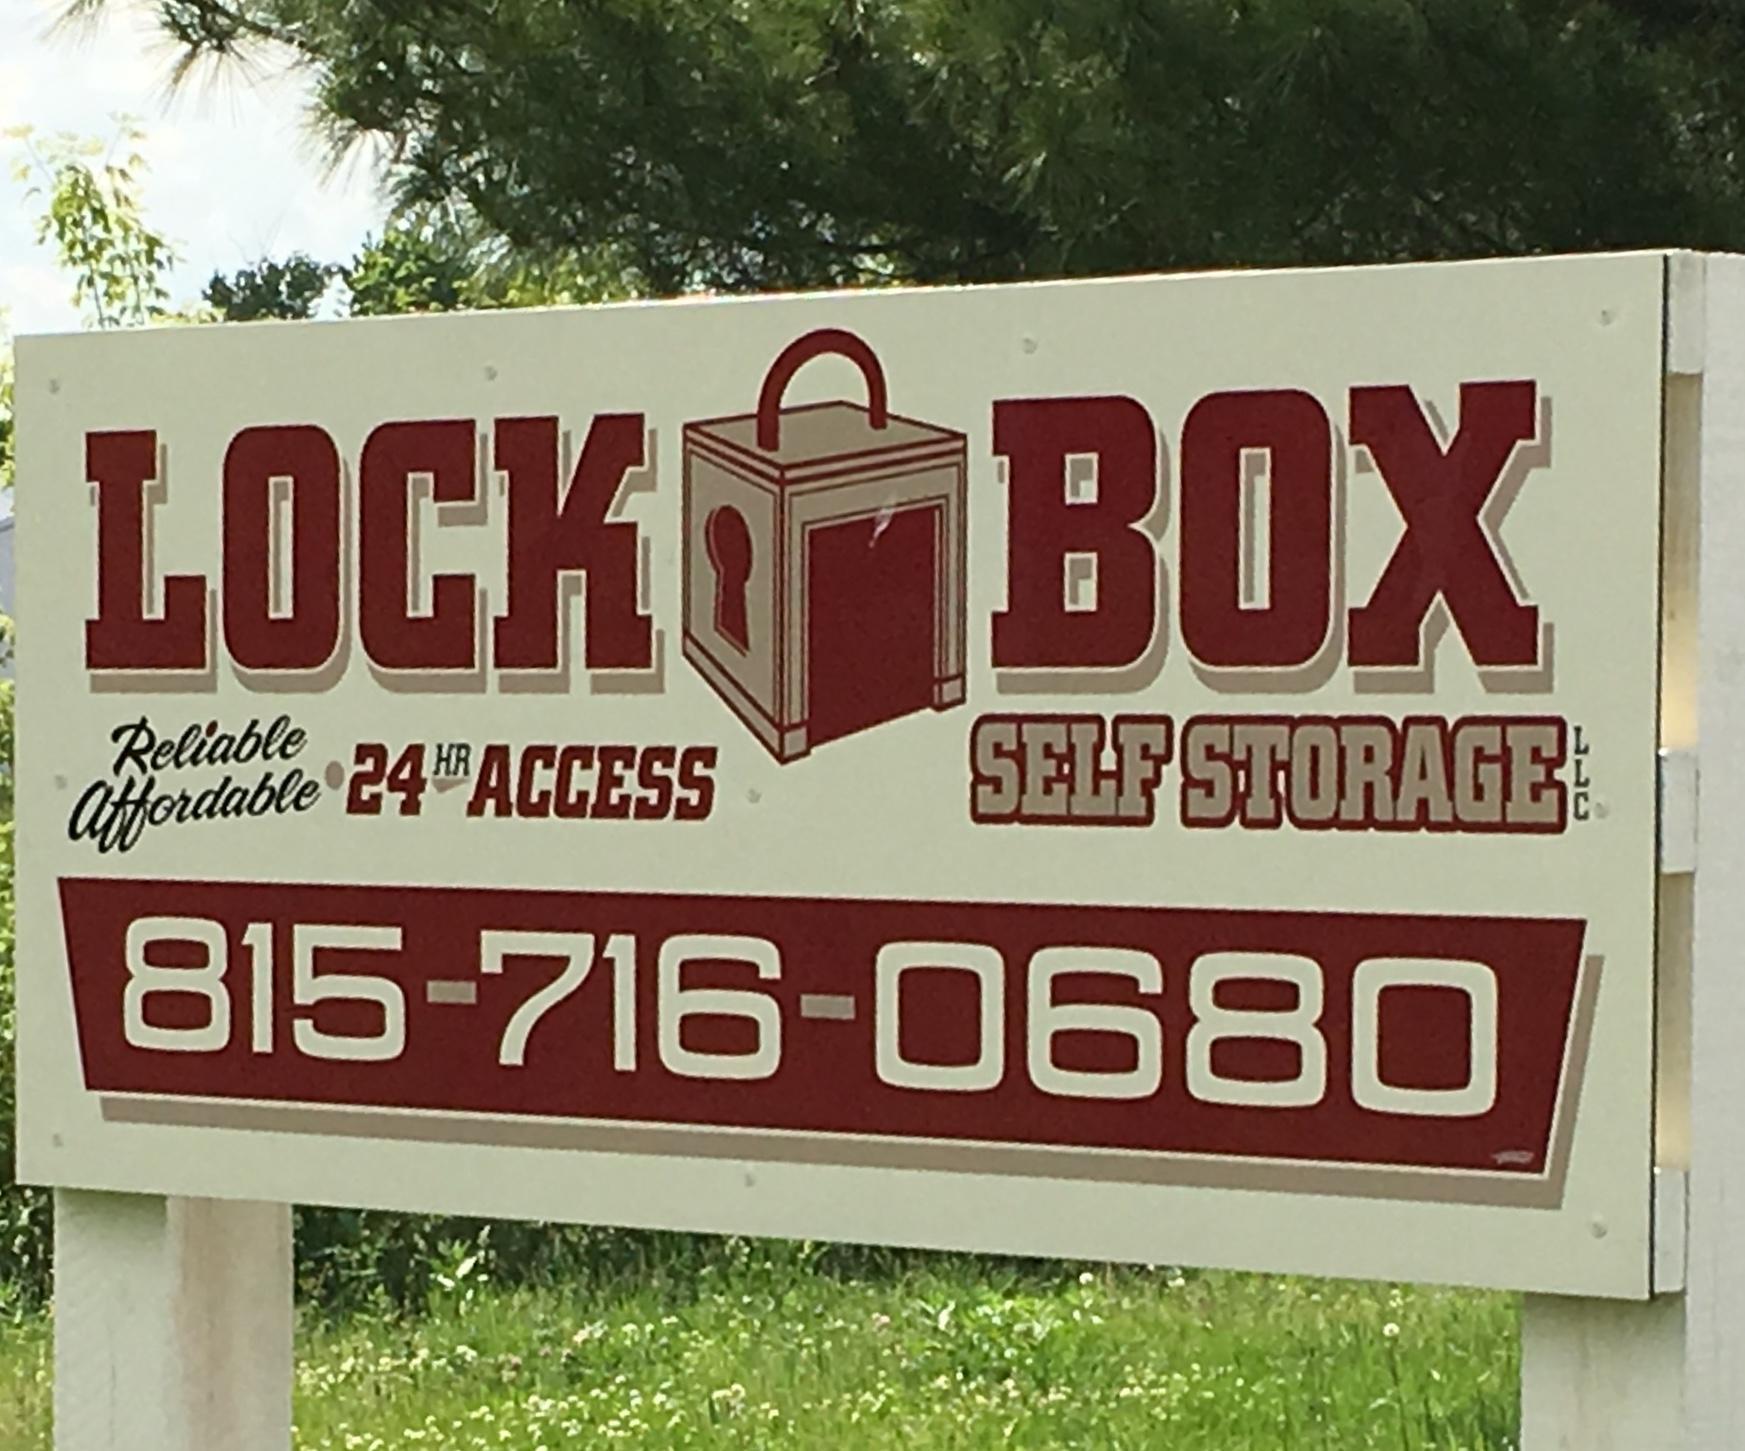 Lockbox Self Storage LLC - Mount Morris, IL image 0